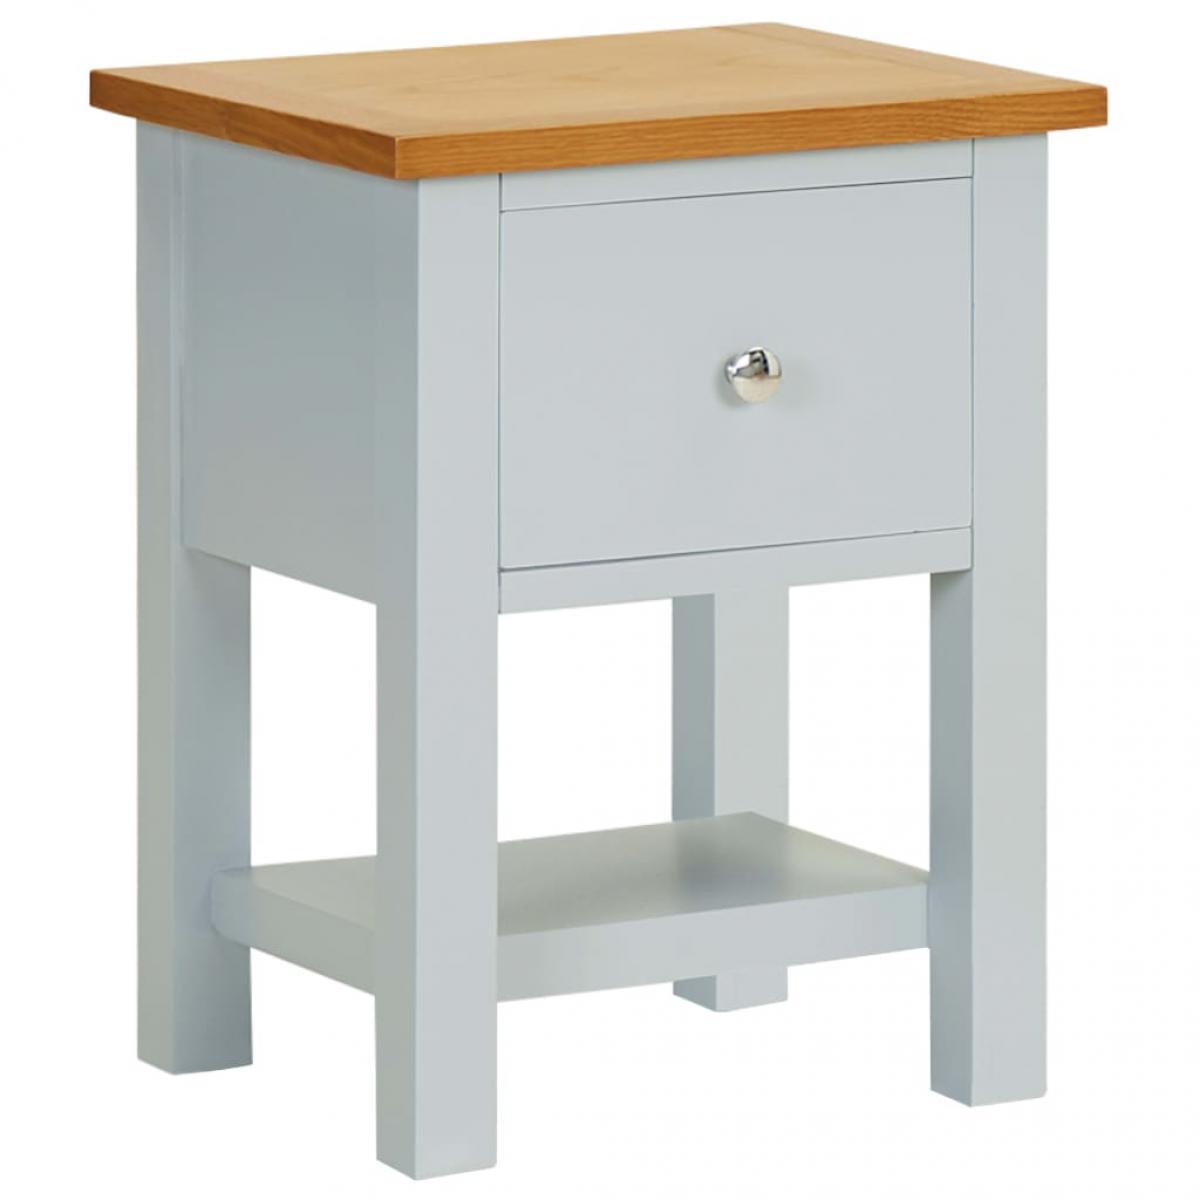 Vidaxl vidaXL Table de chevet 36x30x47 cm Bois de chêne massif